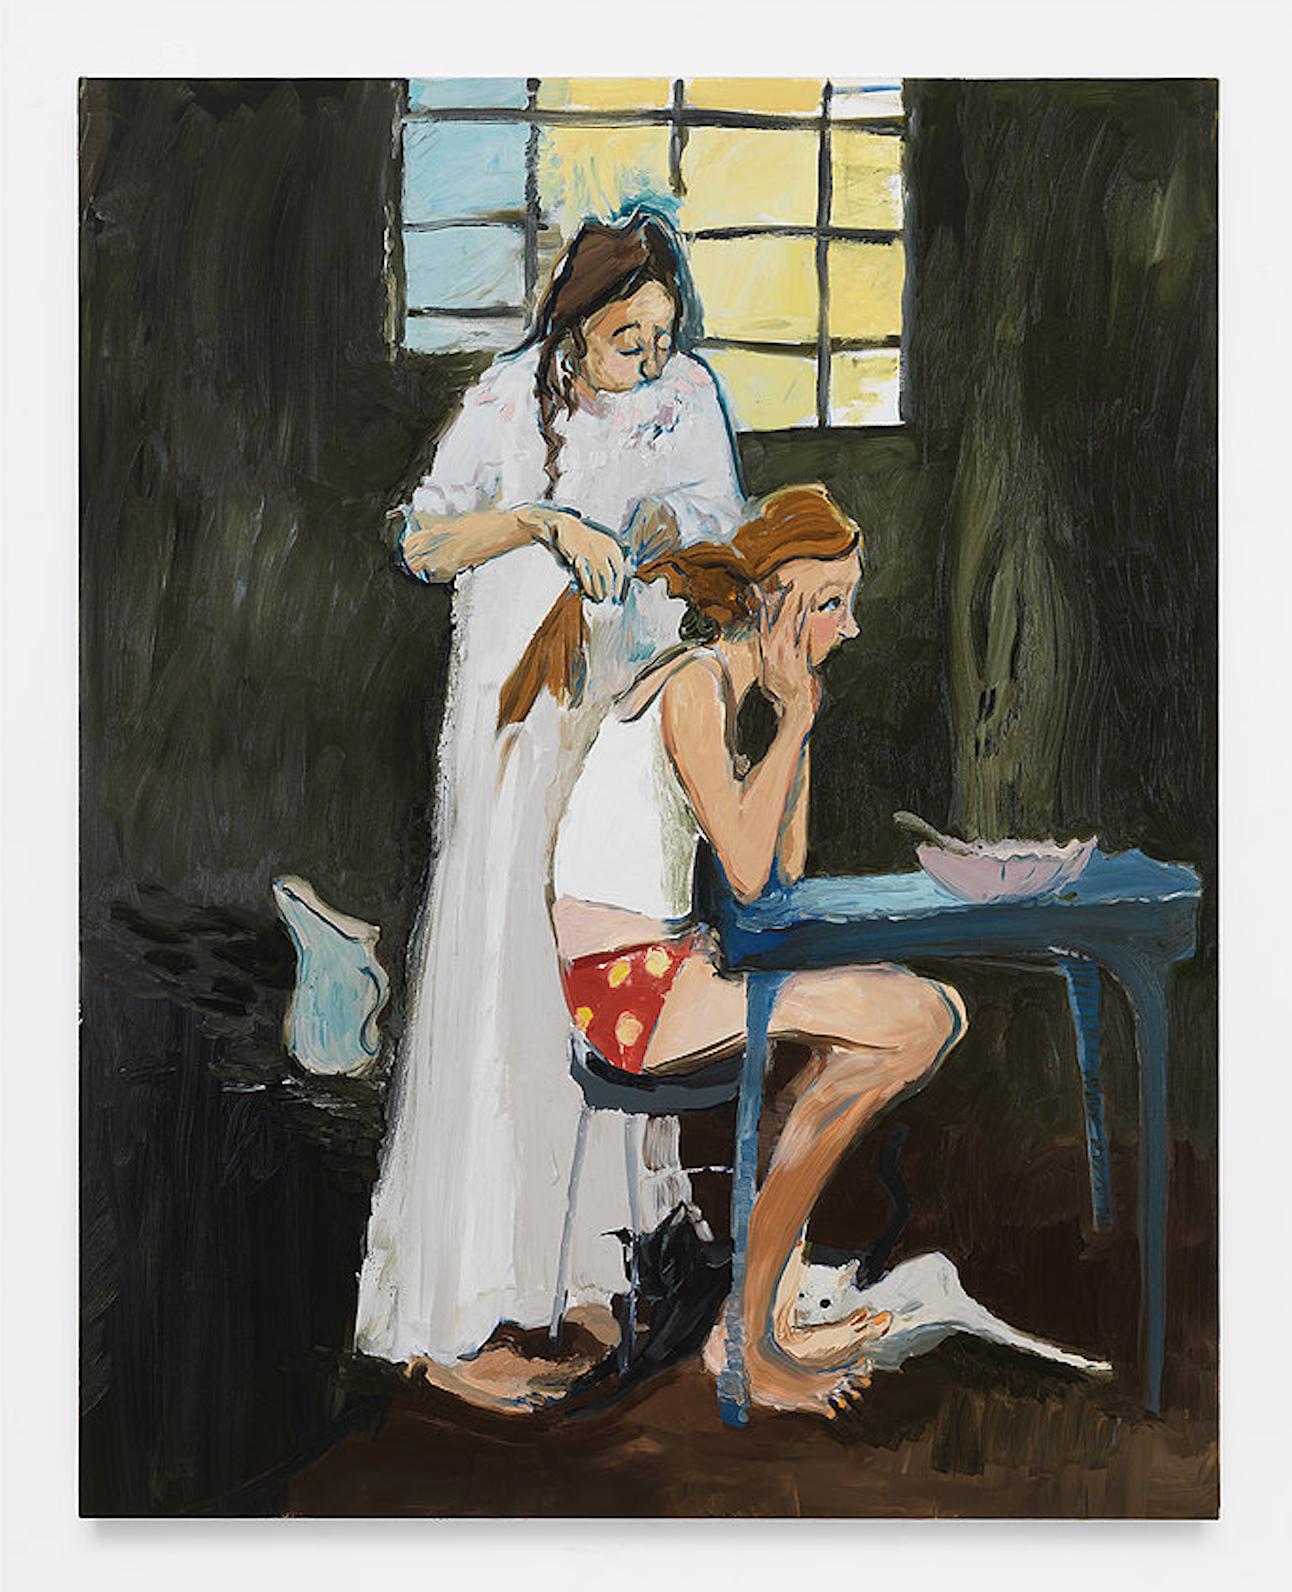 Jane Corrigan,  Morning (I'm scared Mo  m) , 2015. Oil on linen.70 x 55 inches.©Jane Corrigan; Courtesy of MARINARO gallery.